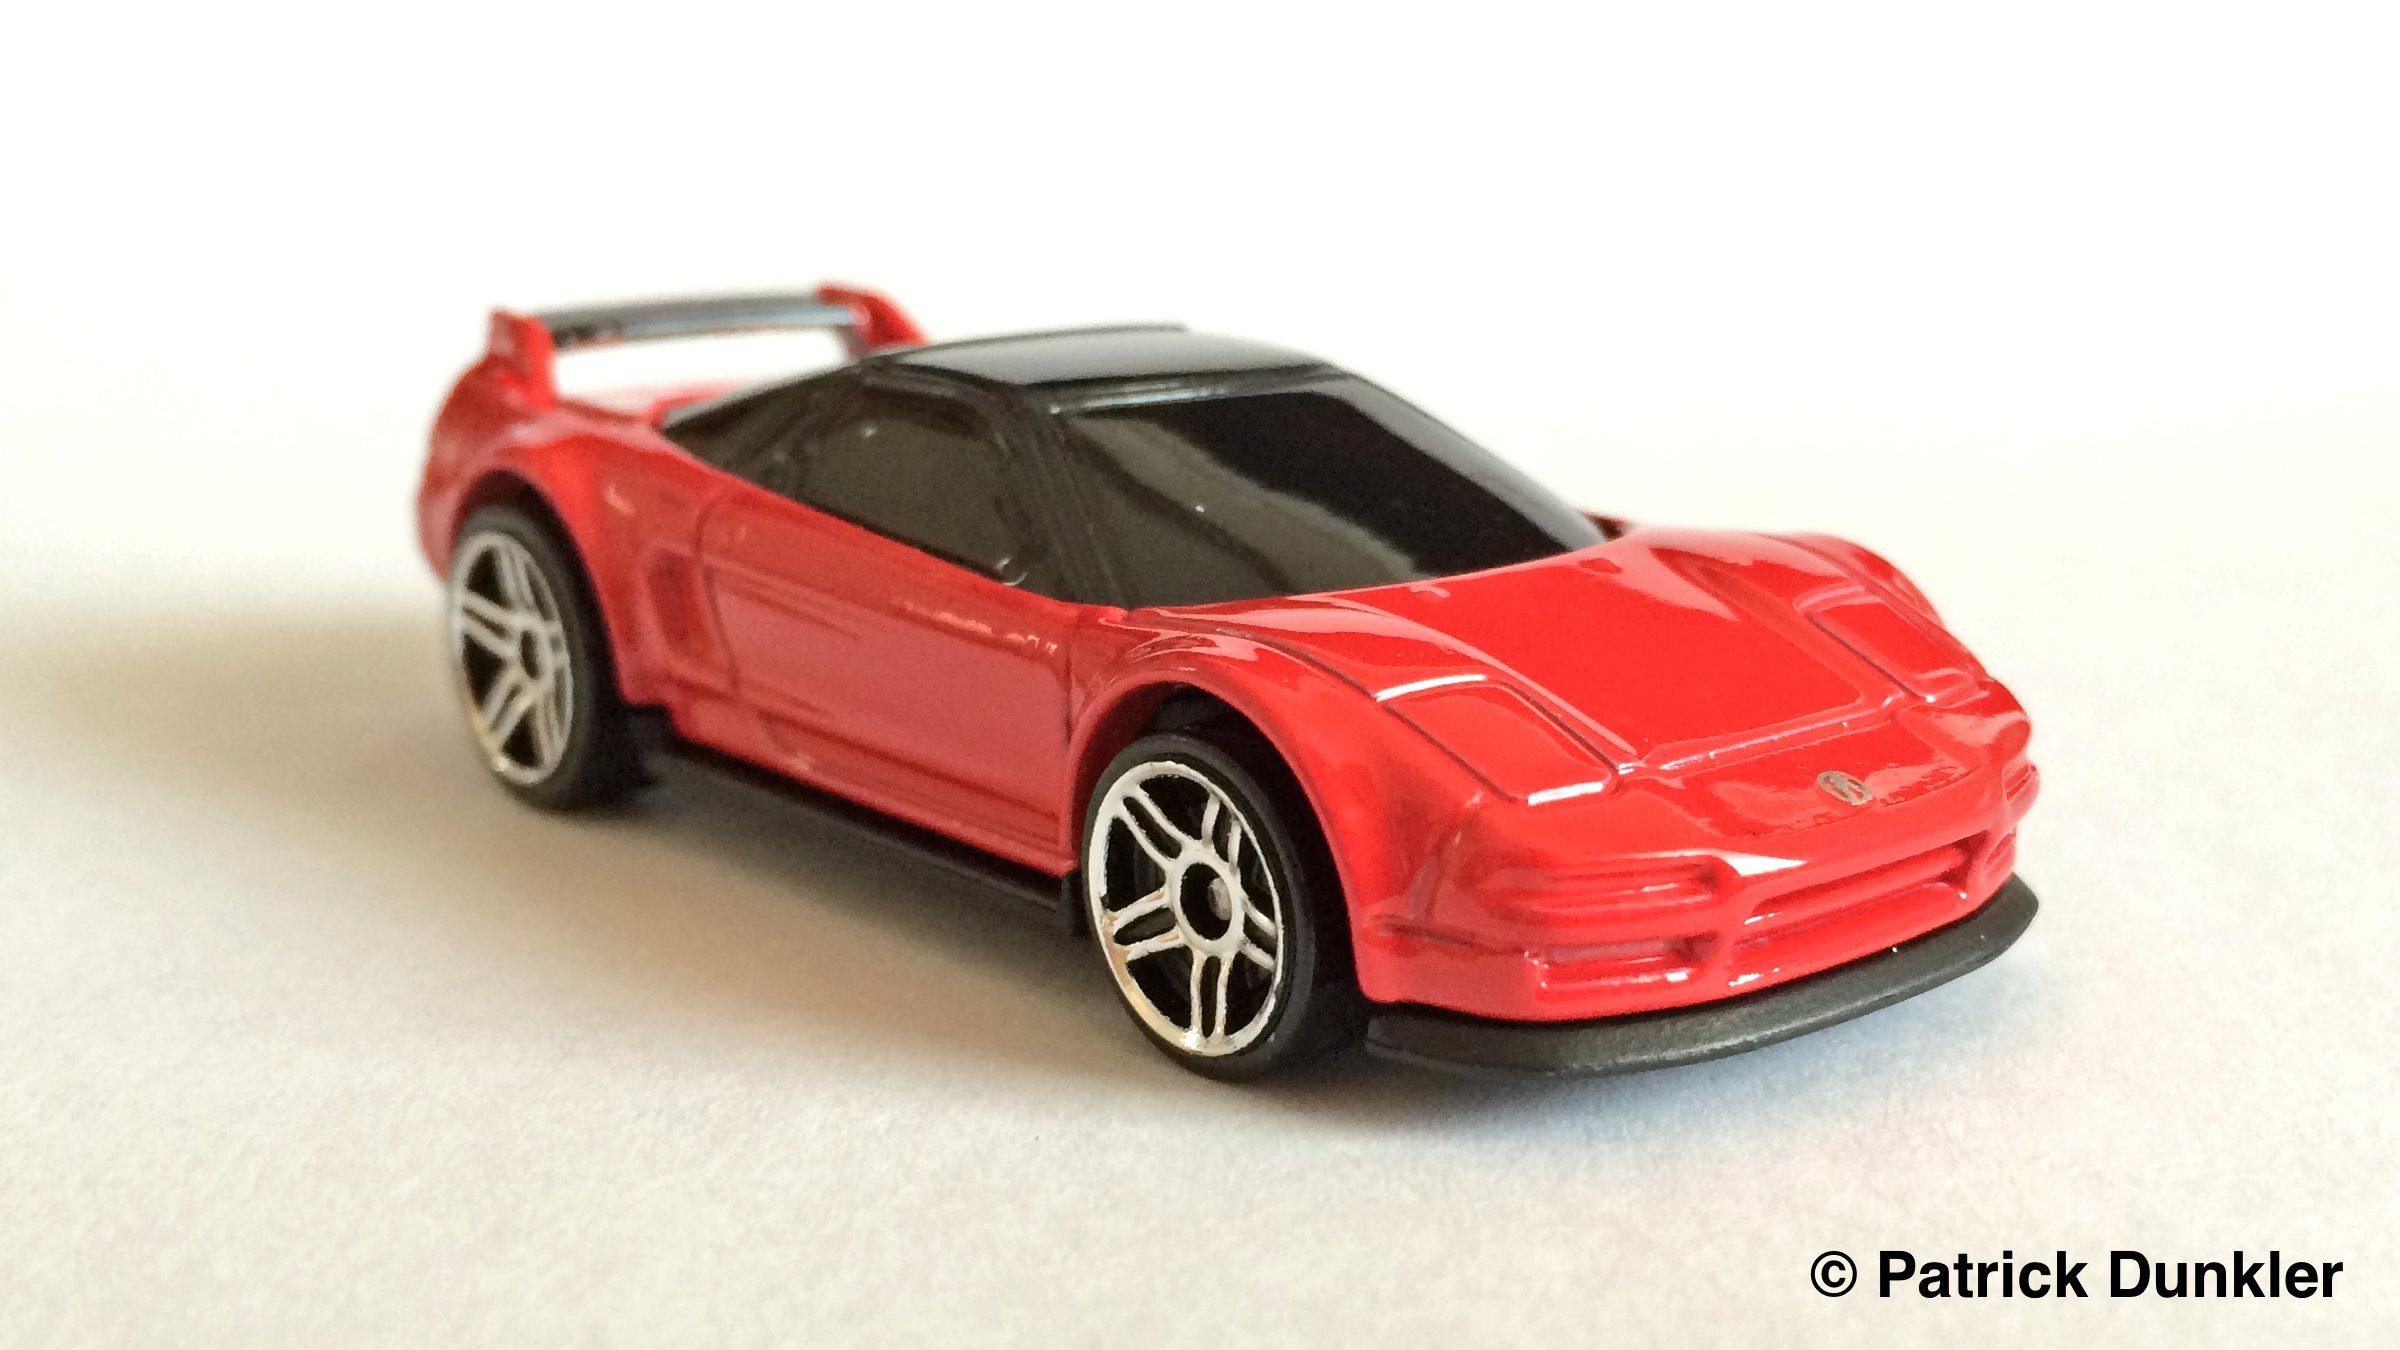 '90 Acura NSX